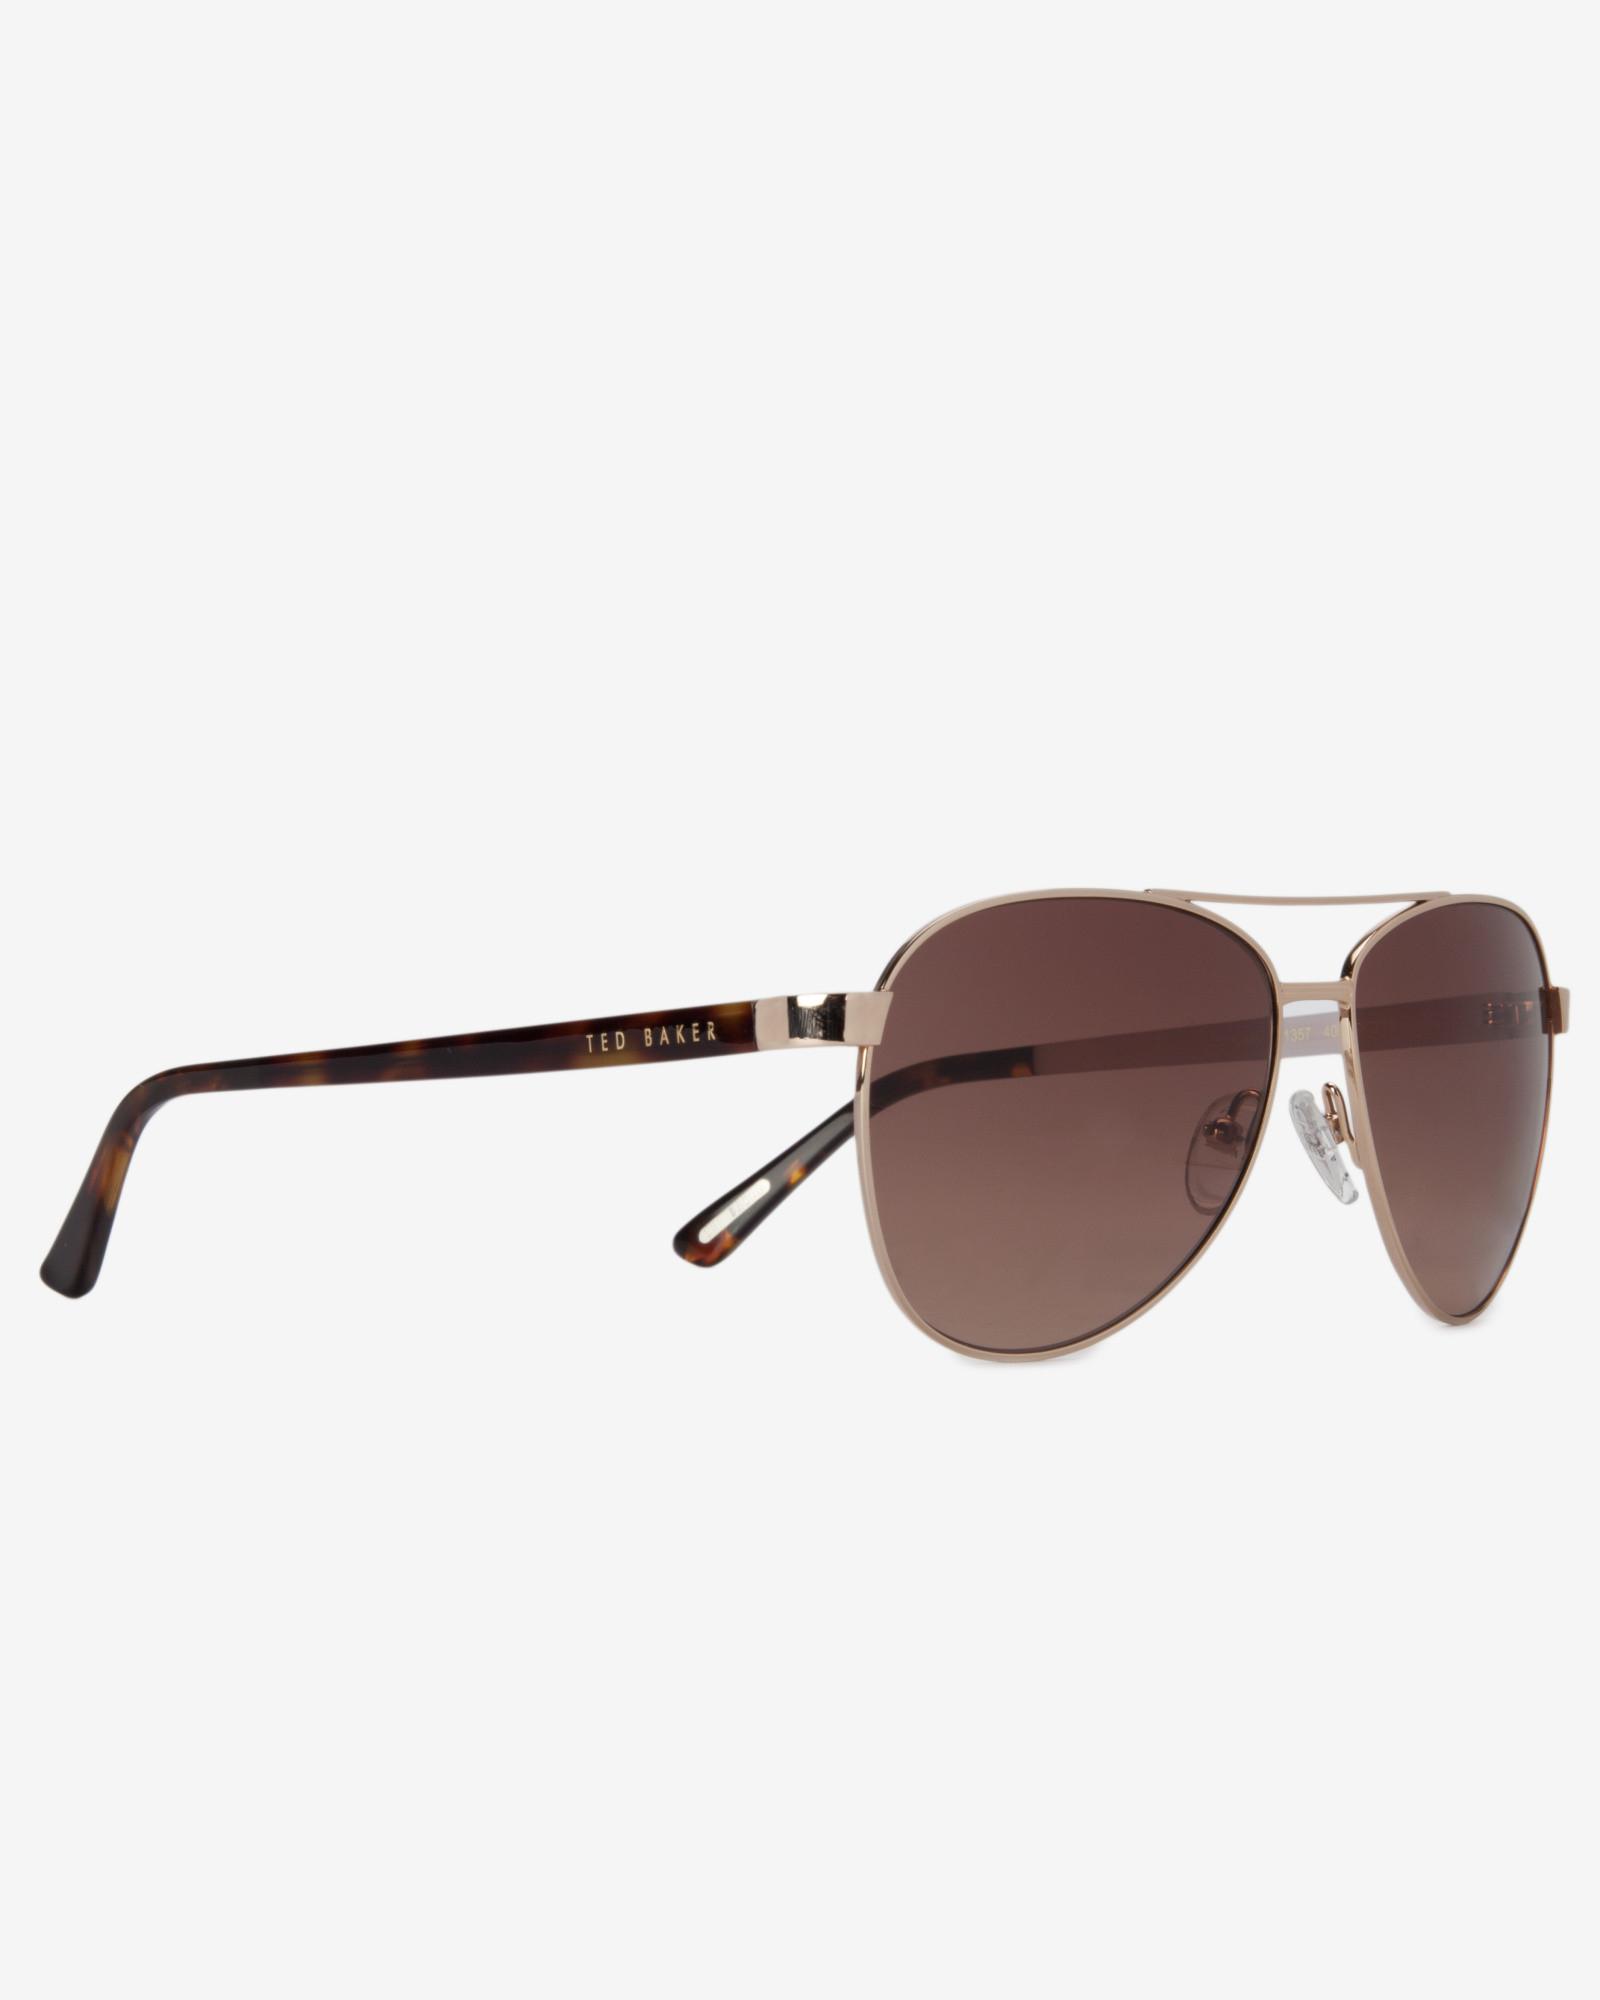 a47a899e9f5 Ted Baker Aviator Sunglasses in Metallic - Lyst